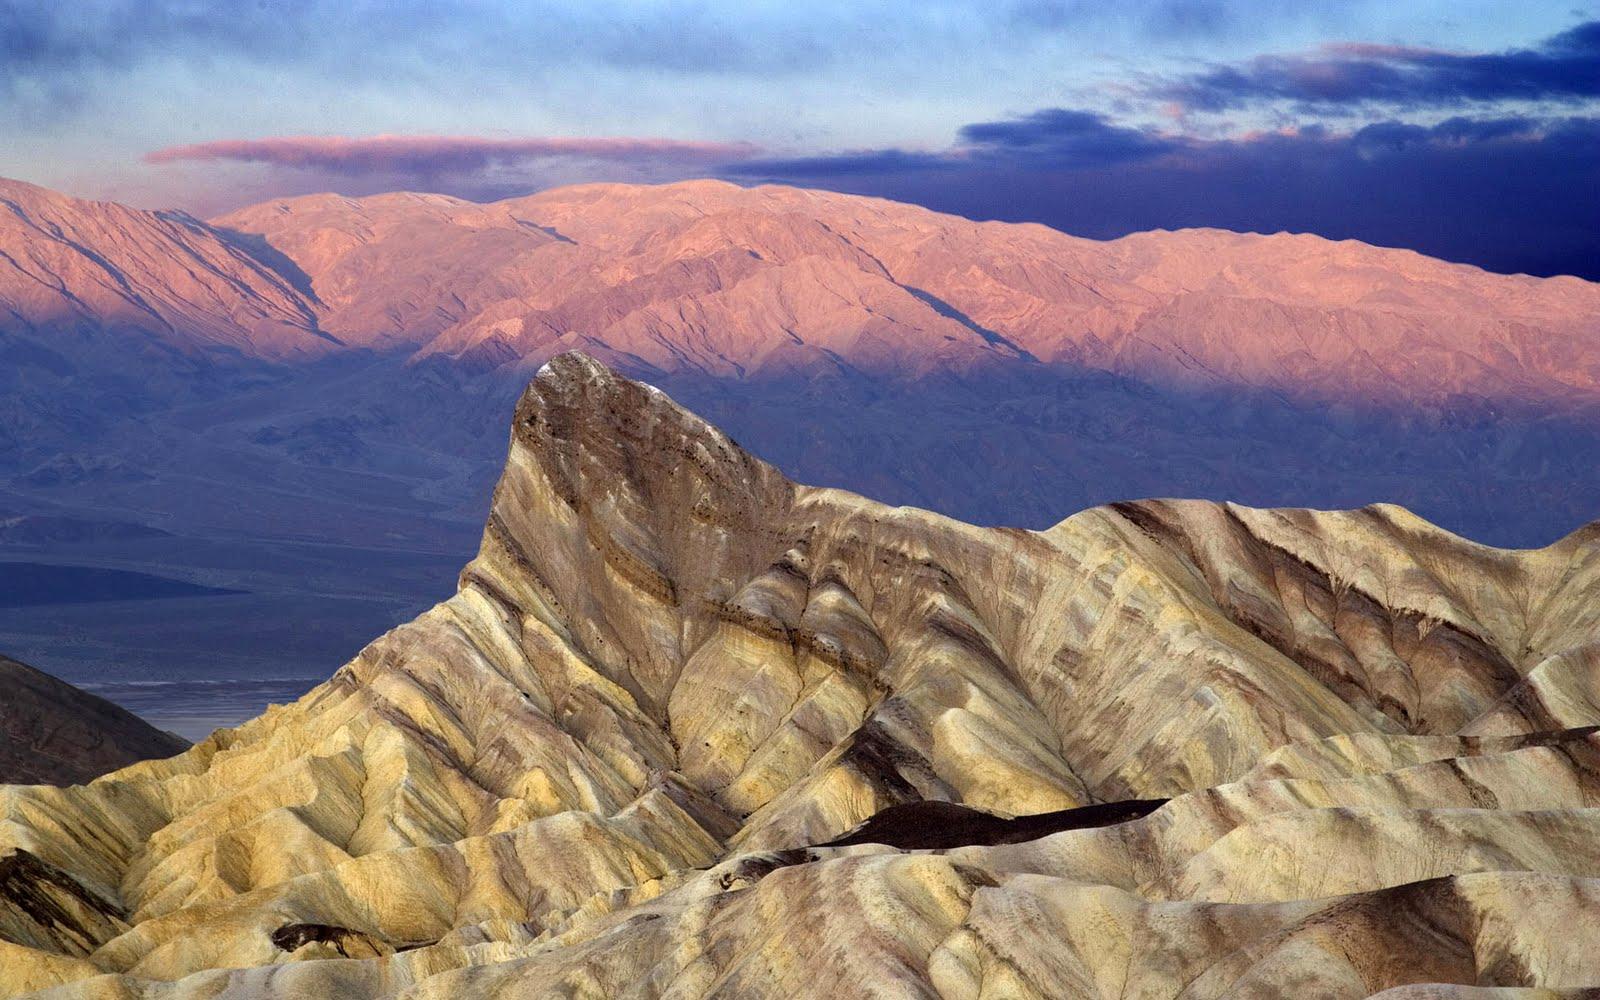 http://4.bp.blogspot.com/_2IU2Nt4rD1k/S7HL5v1SBUI/AAAAAAAABQo/_WdtimmaJrc/s1600/landscape_wallpaper.jpg